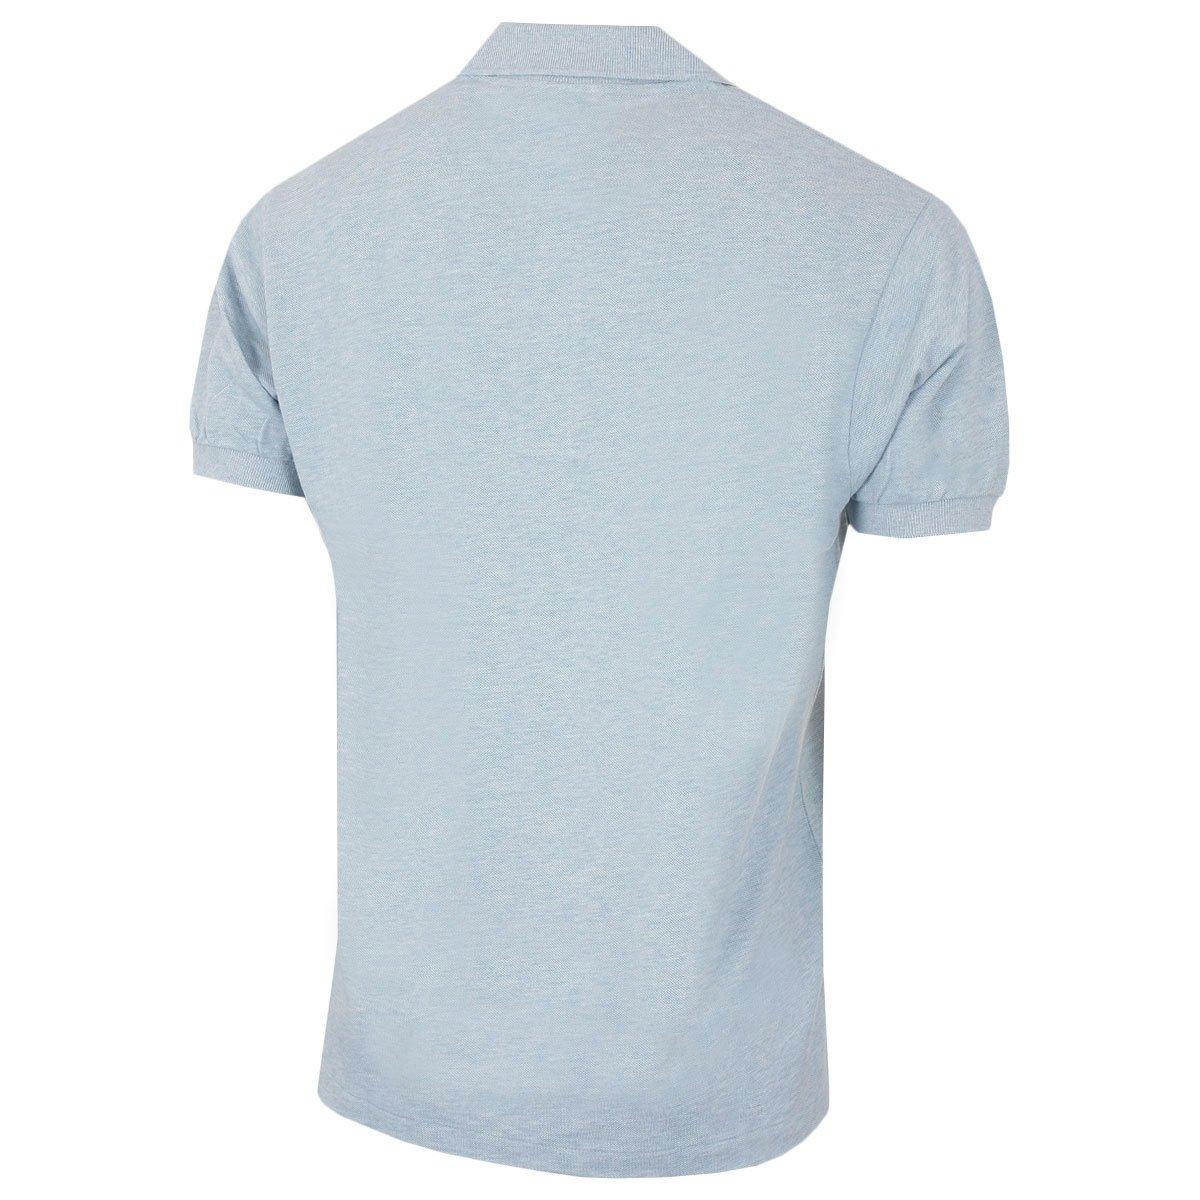 Lacoste Herren Poloshirt Classic Fit B07FPLFKJJ Poloshirts Poloshirts Poloshirts Personalisierungstrend 915ed0